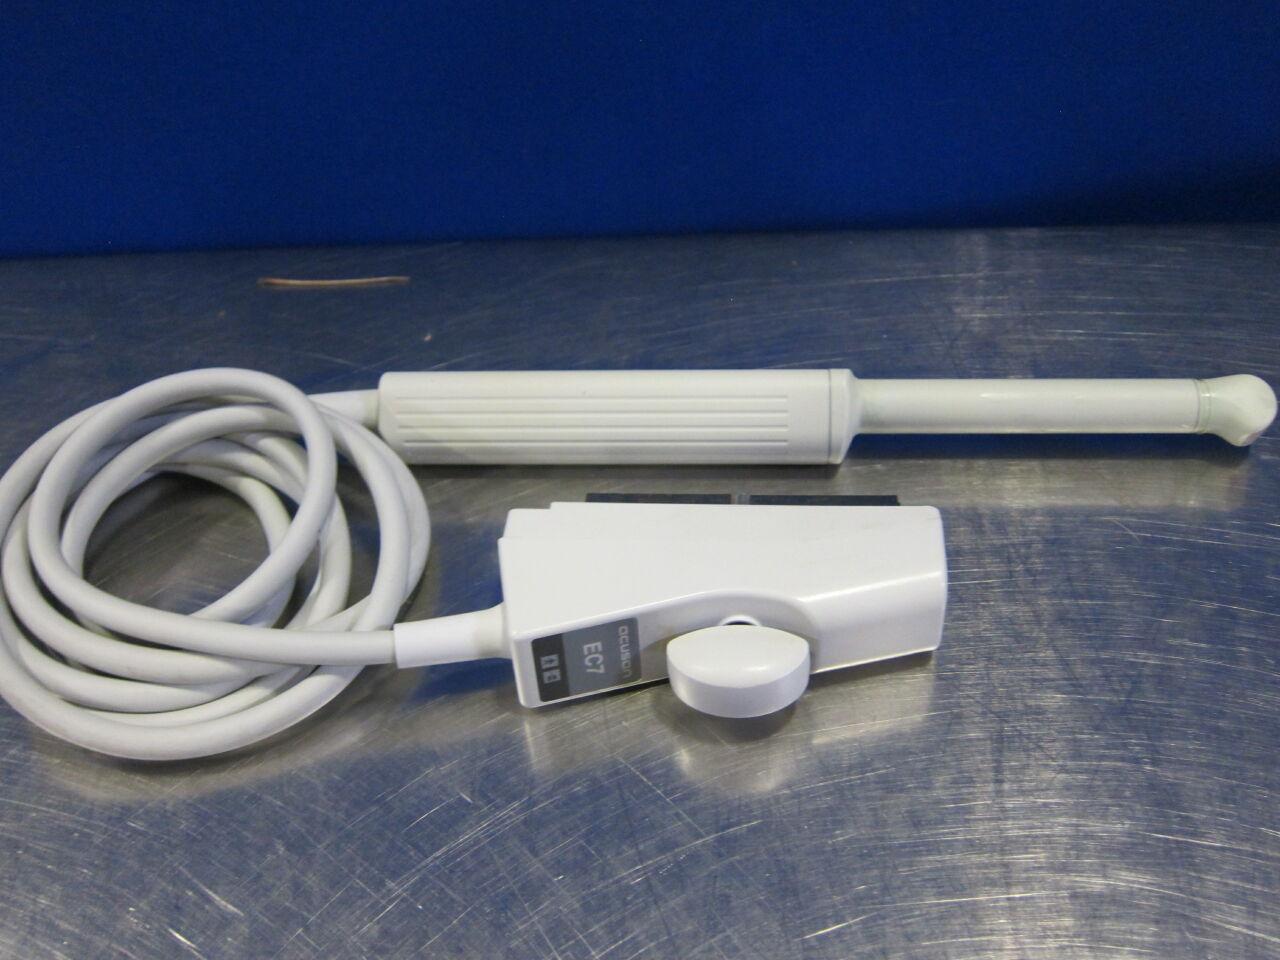 SIEMENS EC7 Ultrasound Transducer